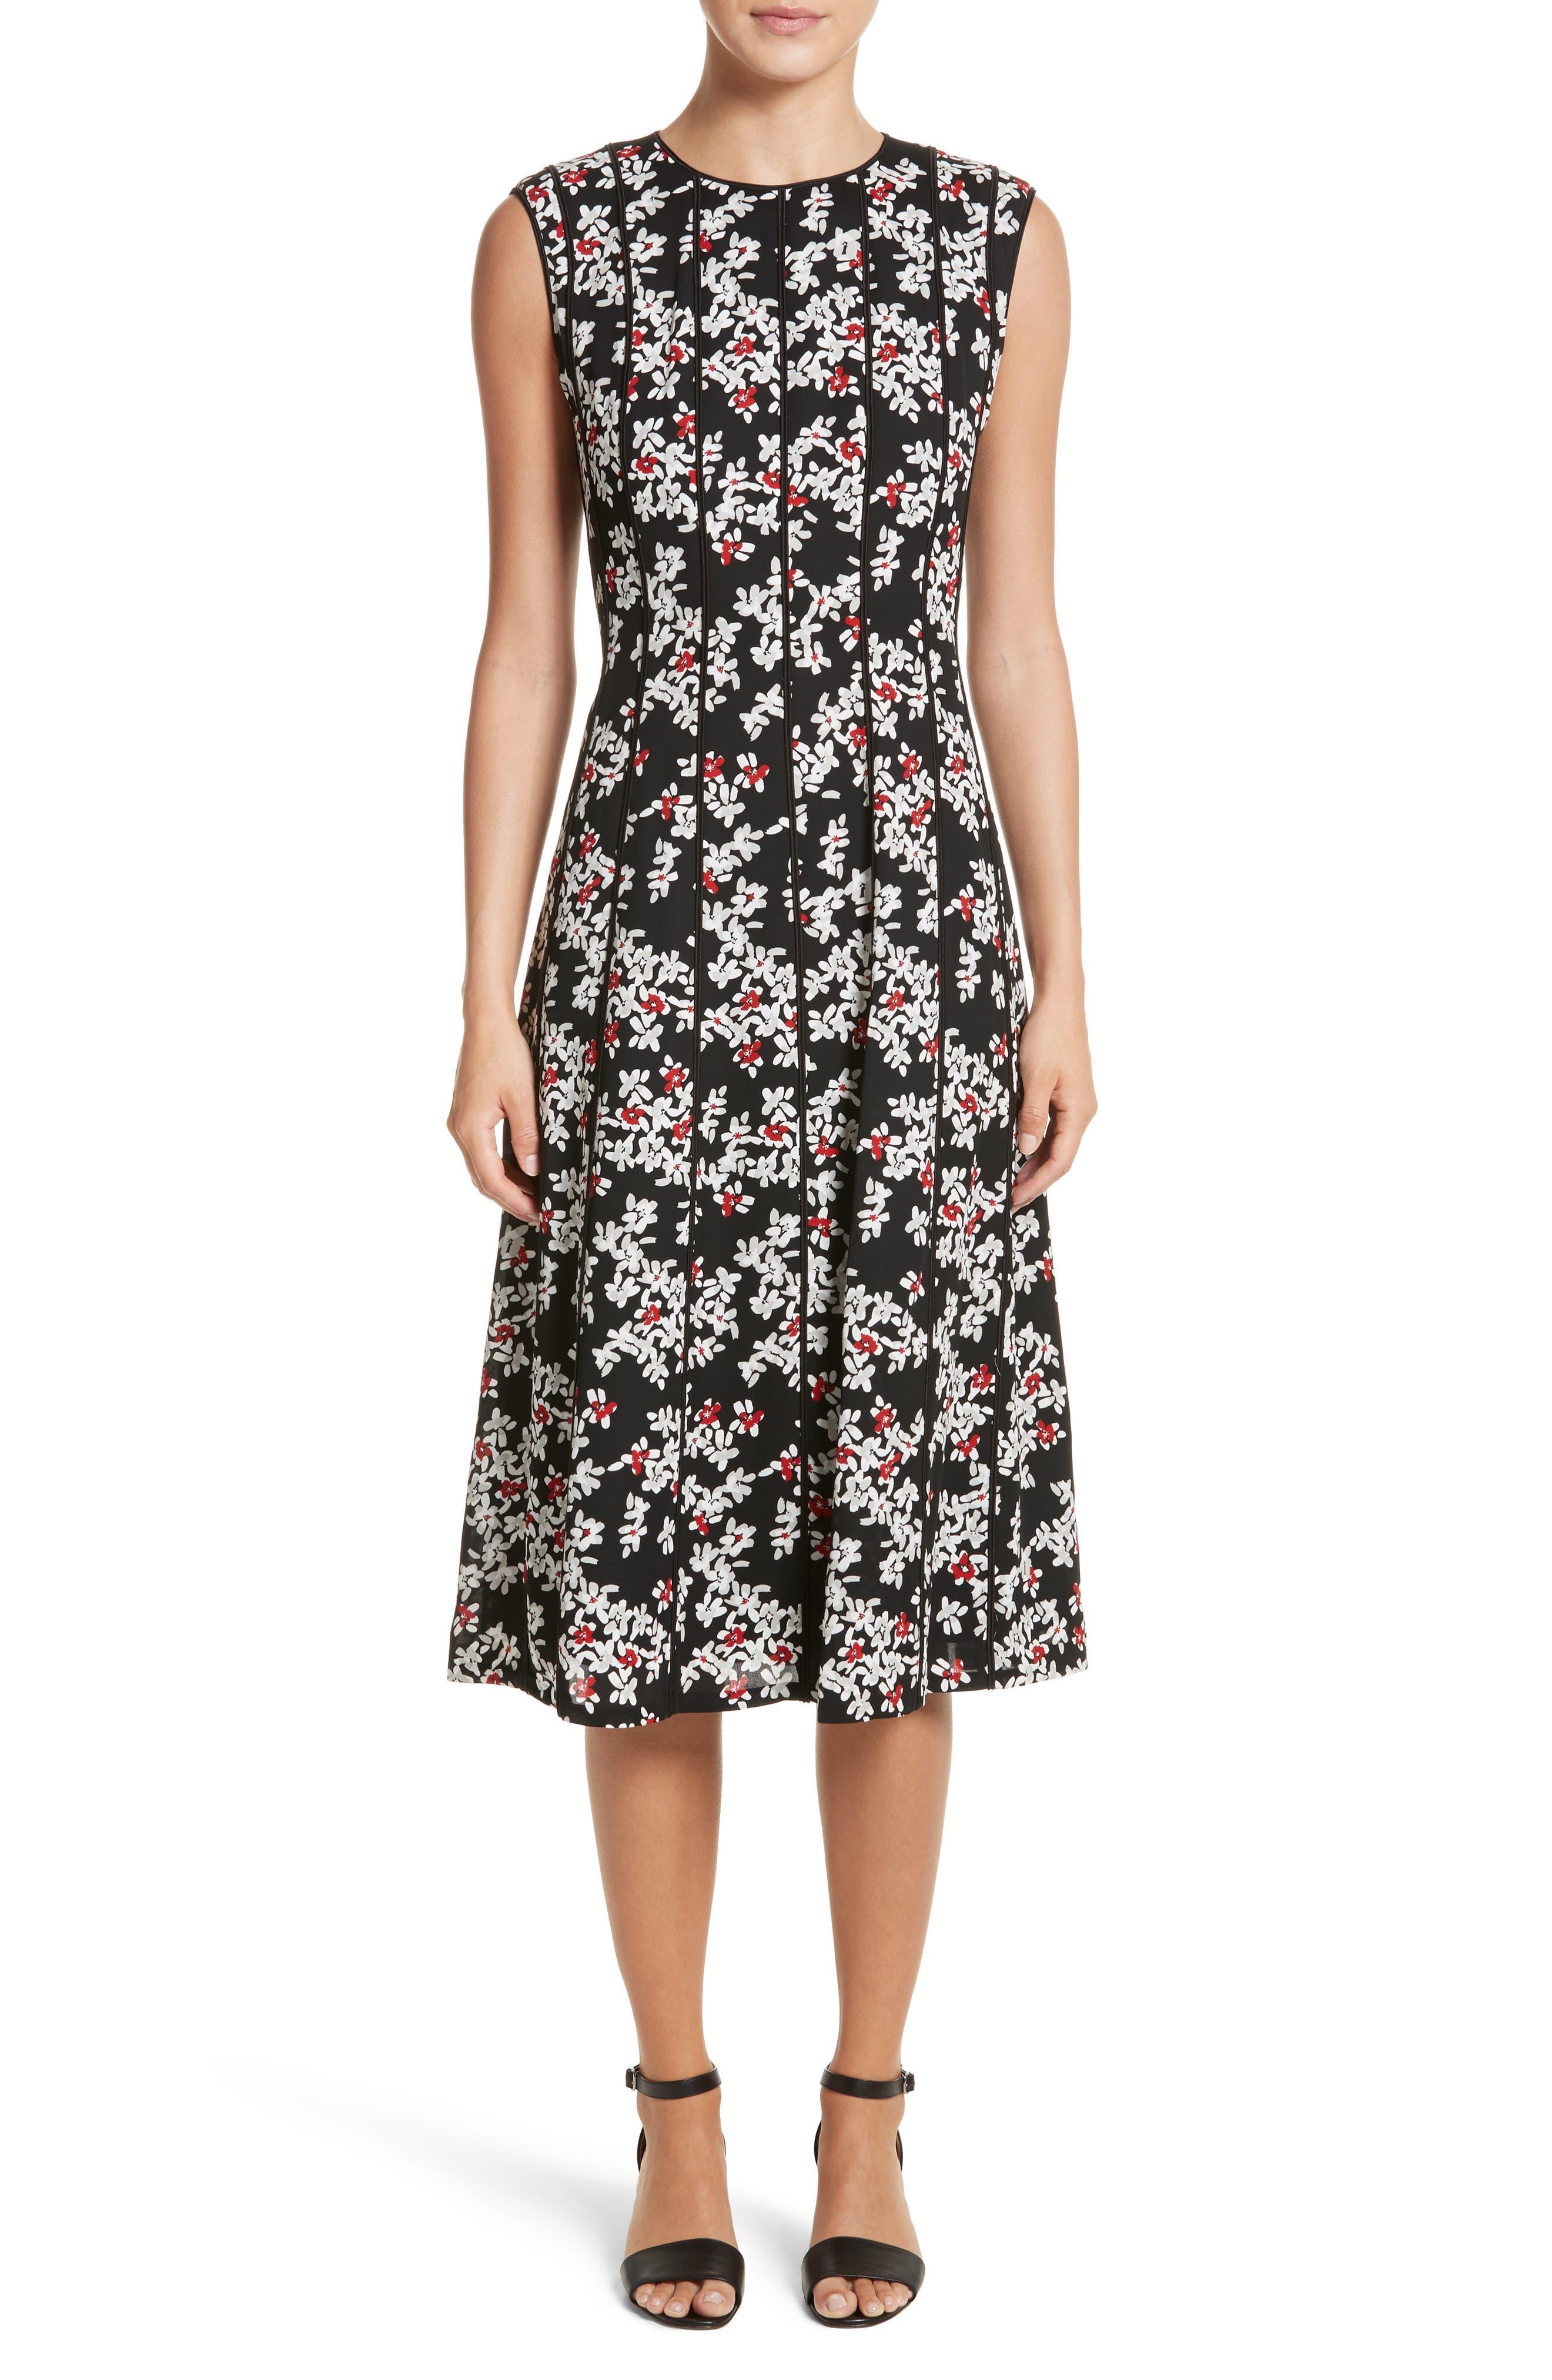 Alternate Image 1 Selected - Lafayette 148 New York Marley Fresh Floral Drape Cloth Dress